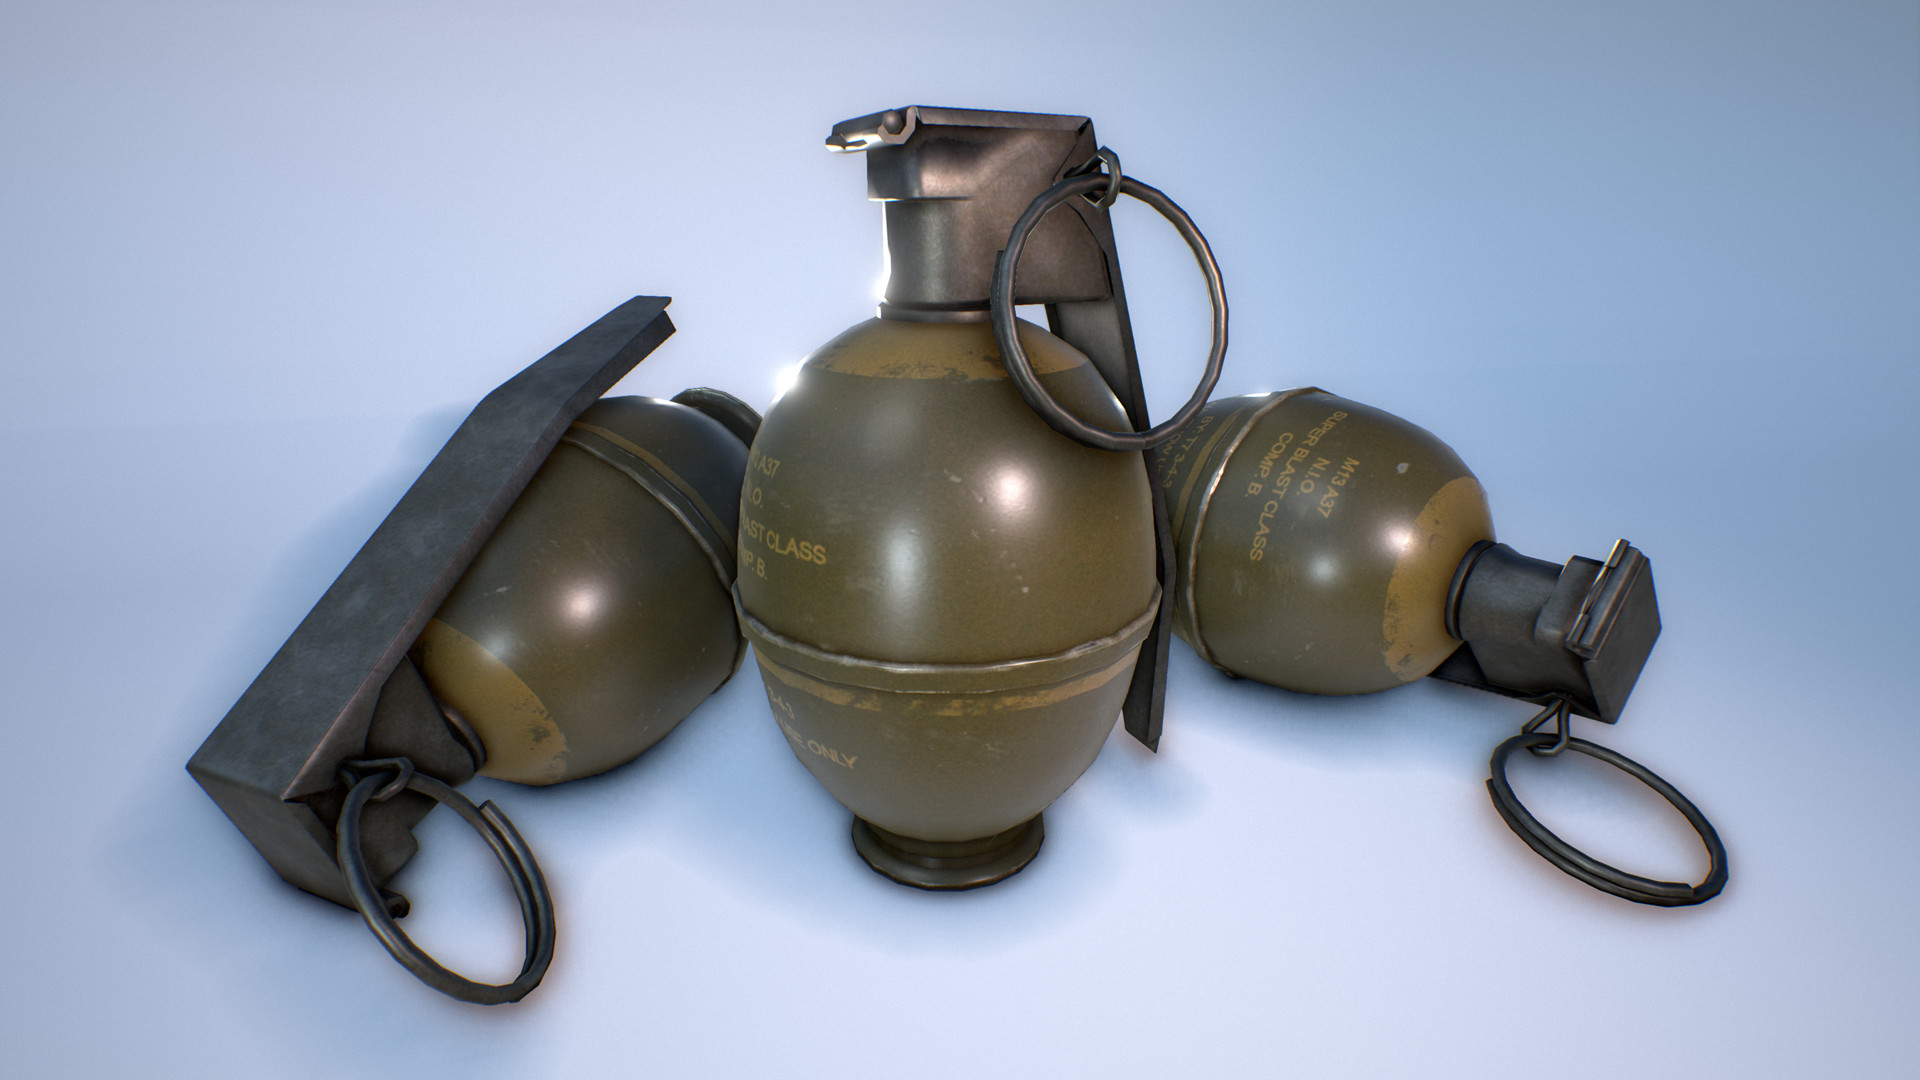 Johannes terhen sundlov grenade as